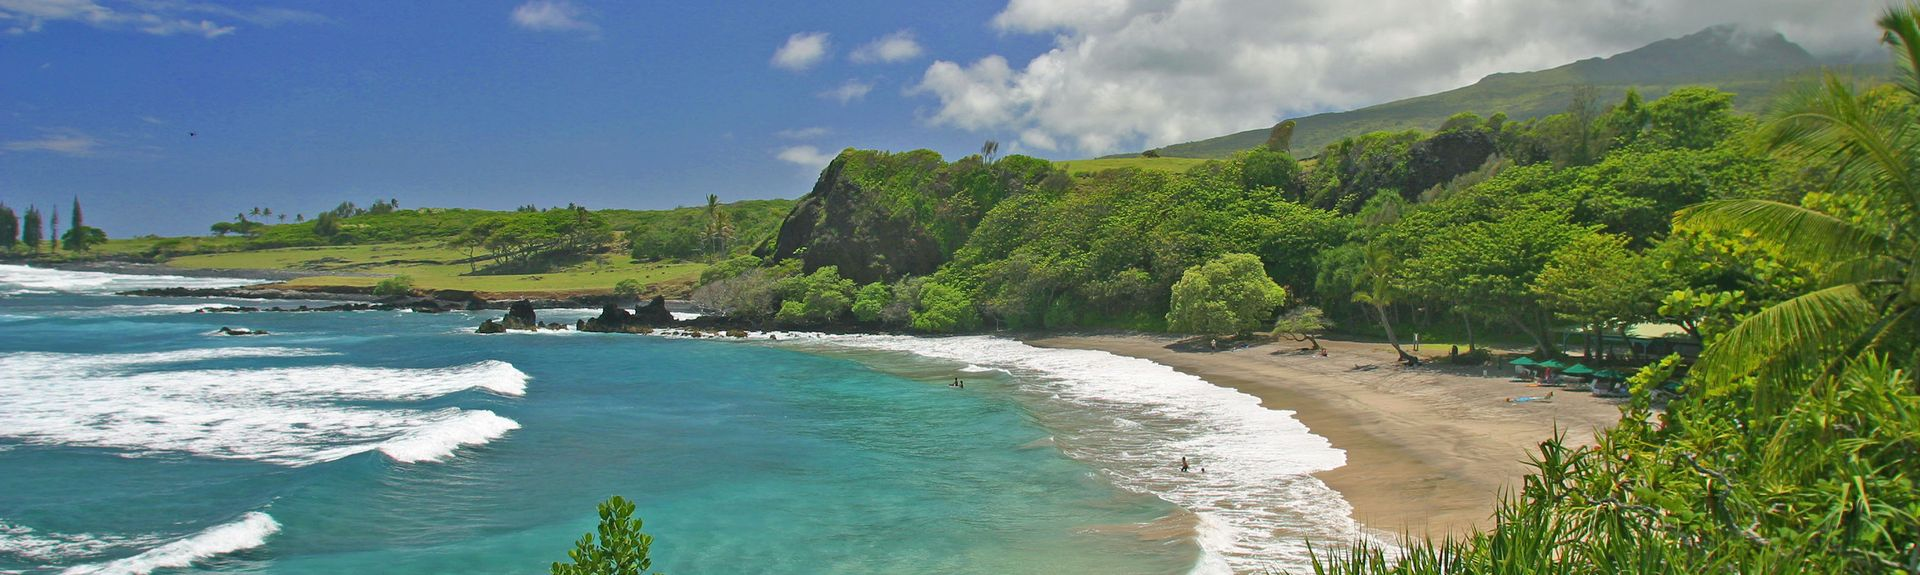 East Maui, Hawaï, États-Unis d'Amérique